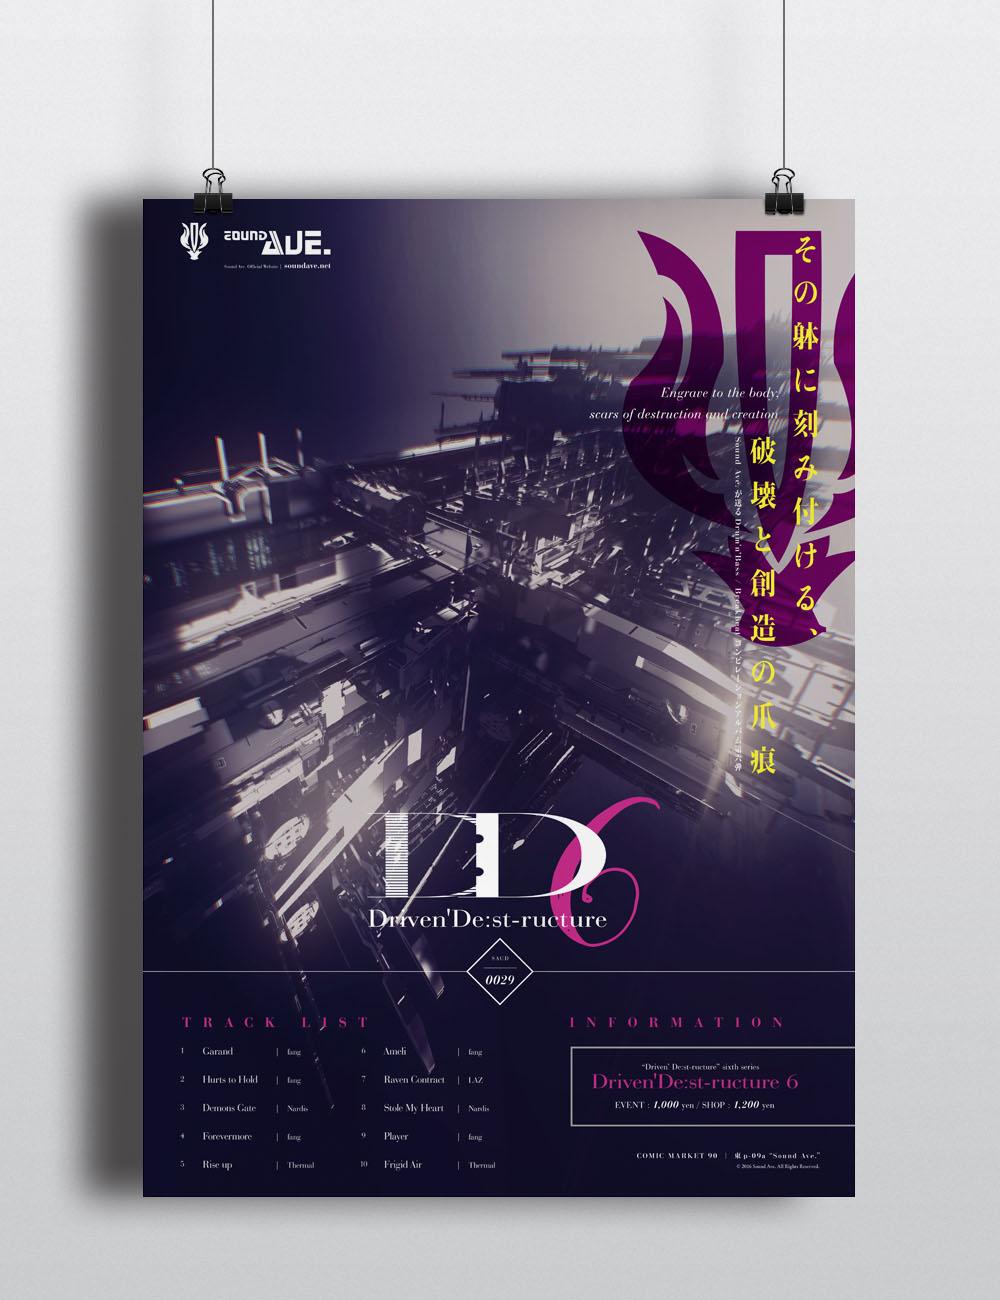 Driven' De:st-ructure 6 Poster